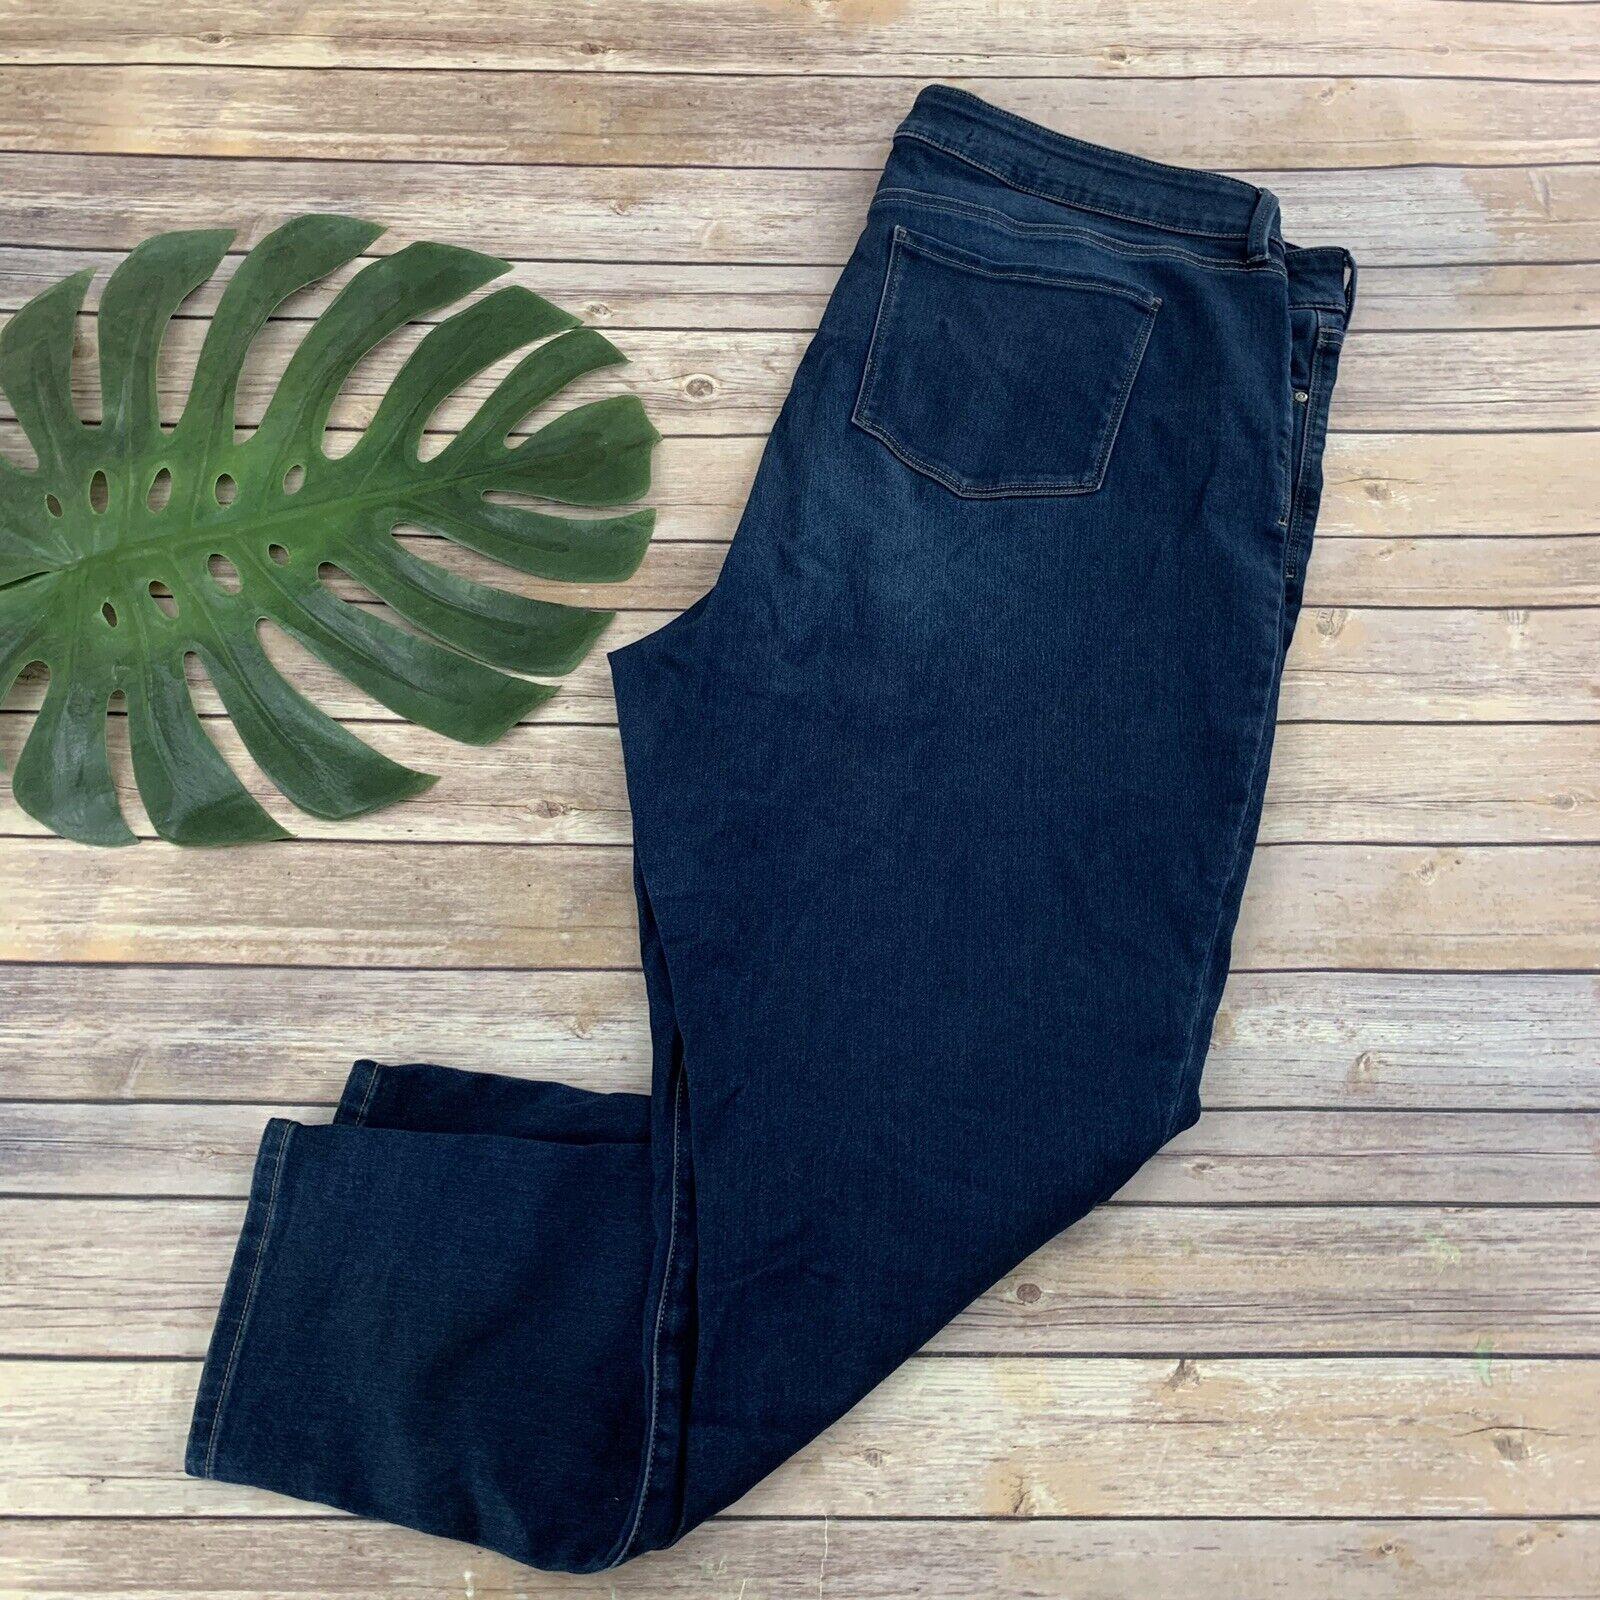 NYDJ Not Your Daughters Jeans Alina Legging Skinny Plus Size 24W Dark Wash